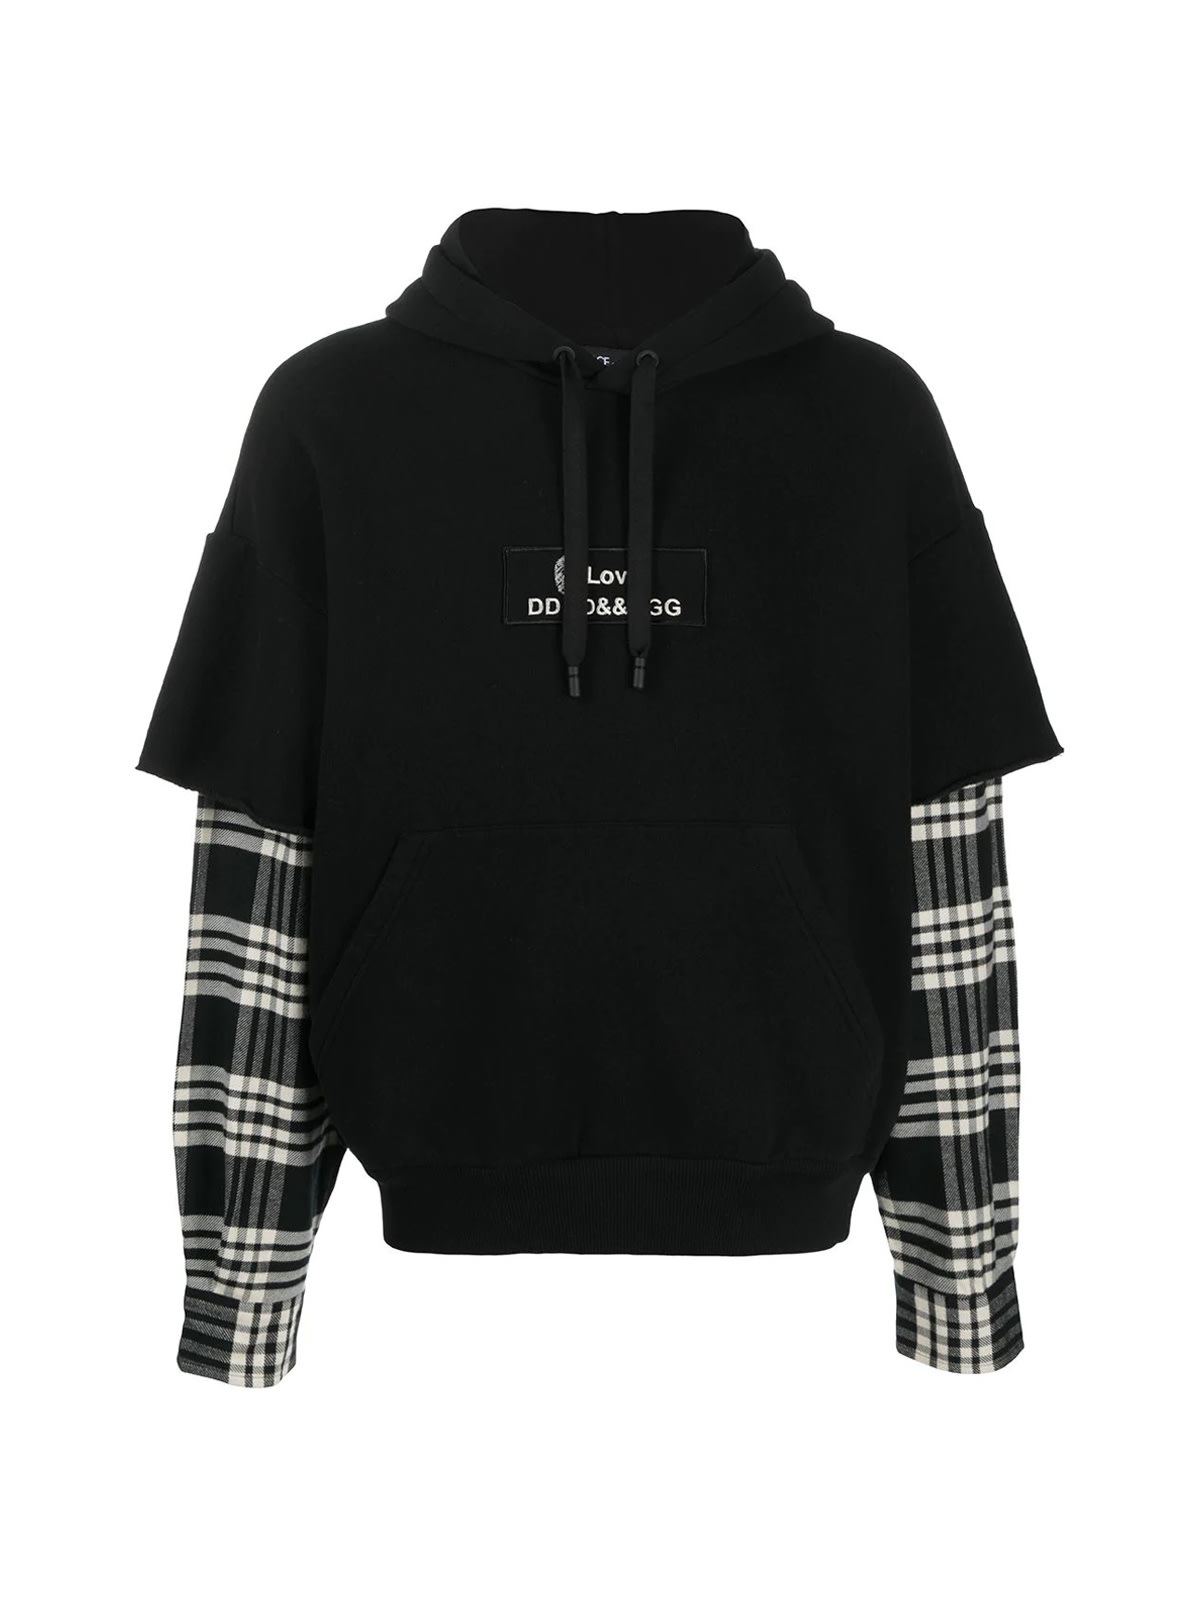 Dolce & Gabbana Hoodies Sweatshirt